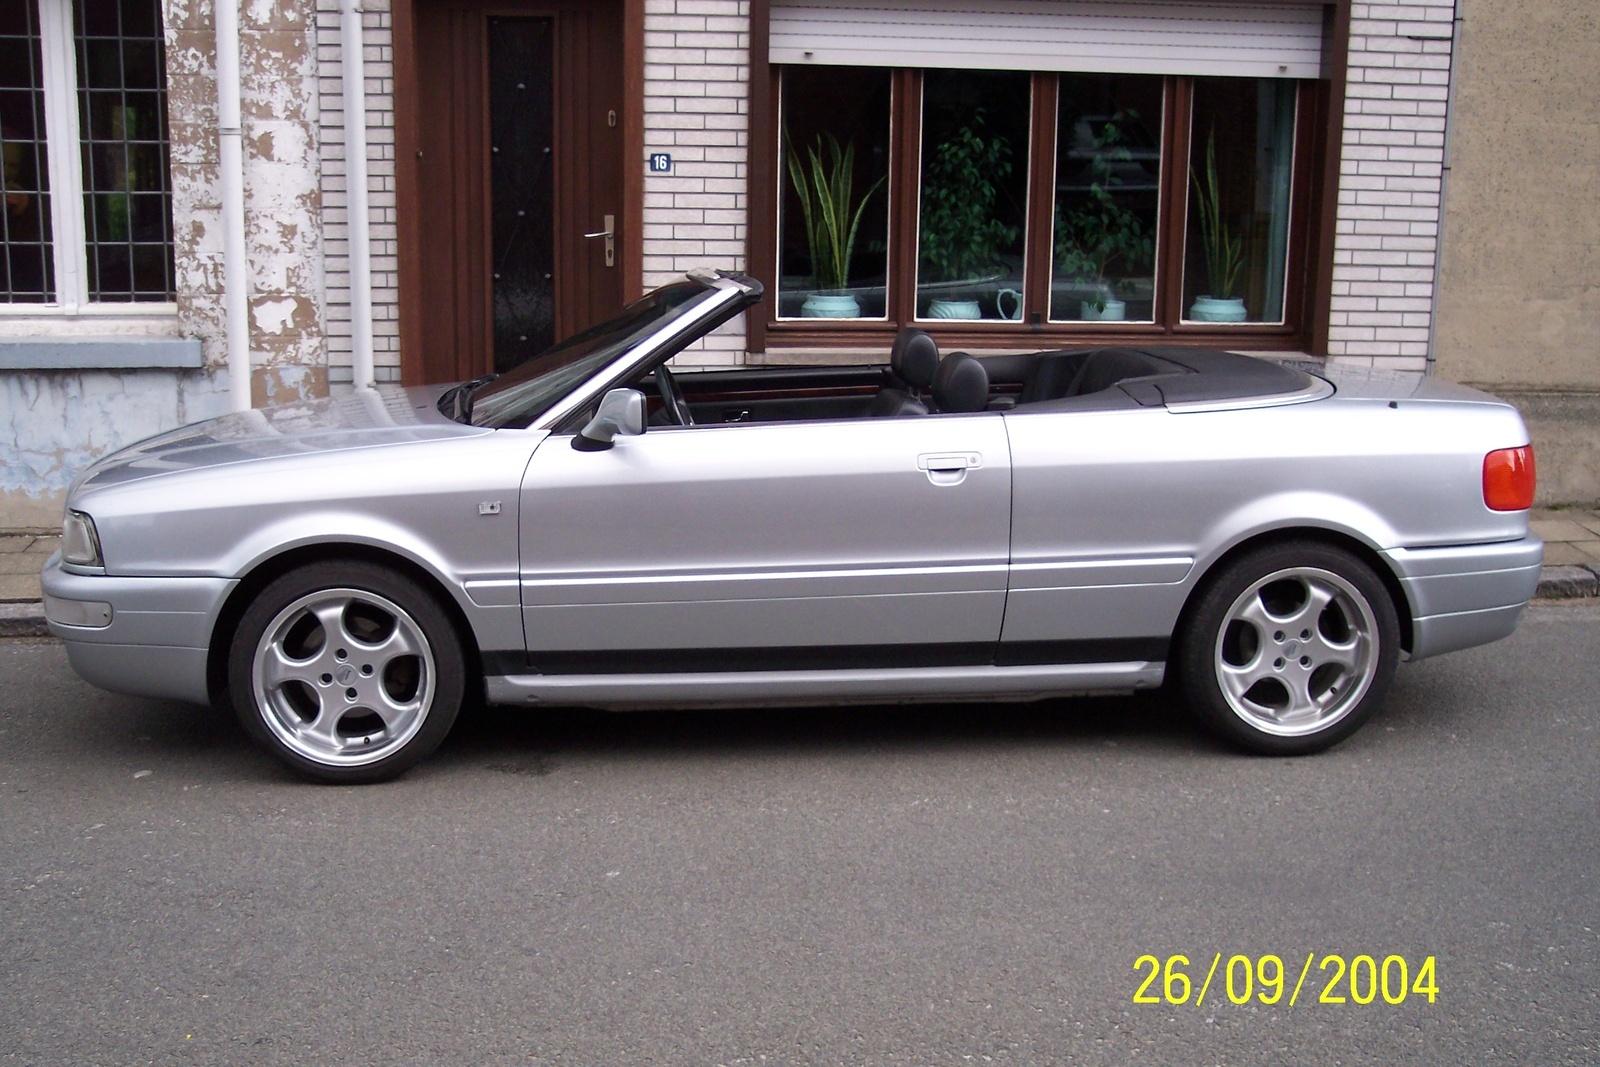 Audi audi a4 coup : 1998 Audi Cabriolet - Overview - CarGurus